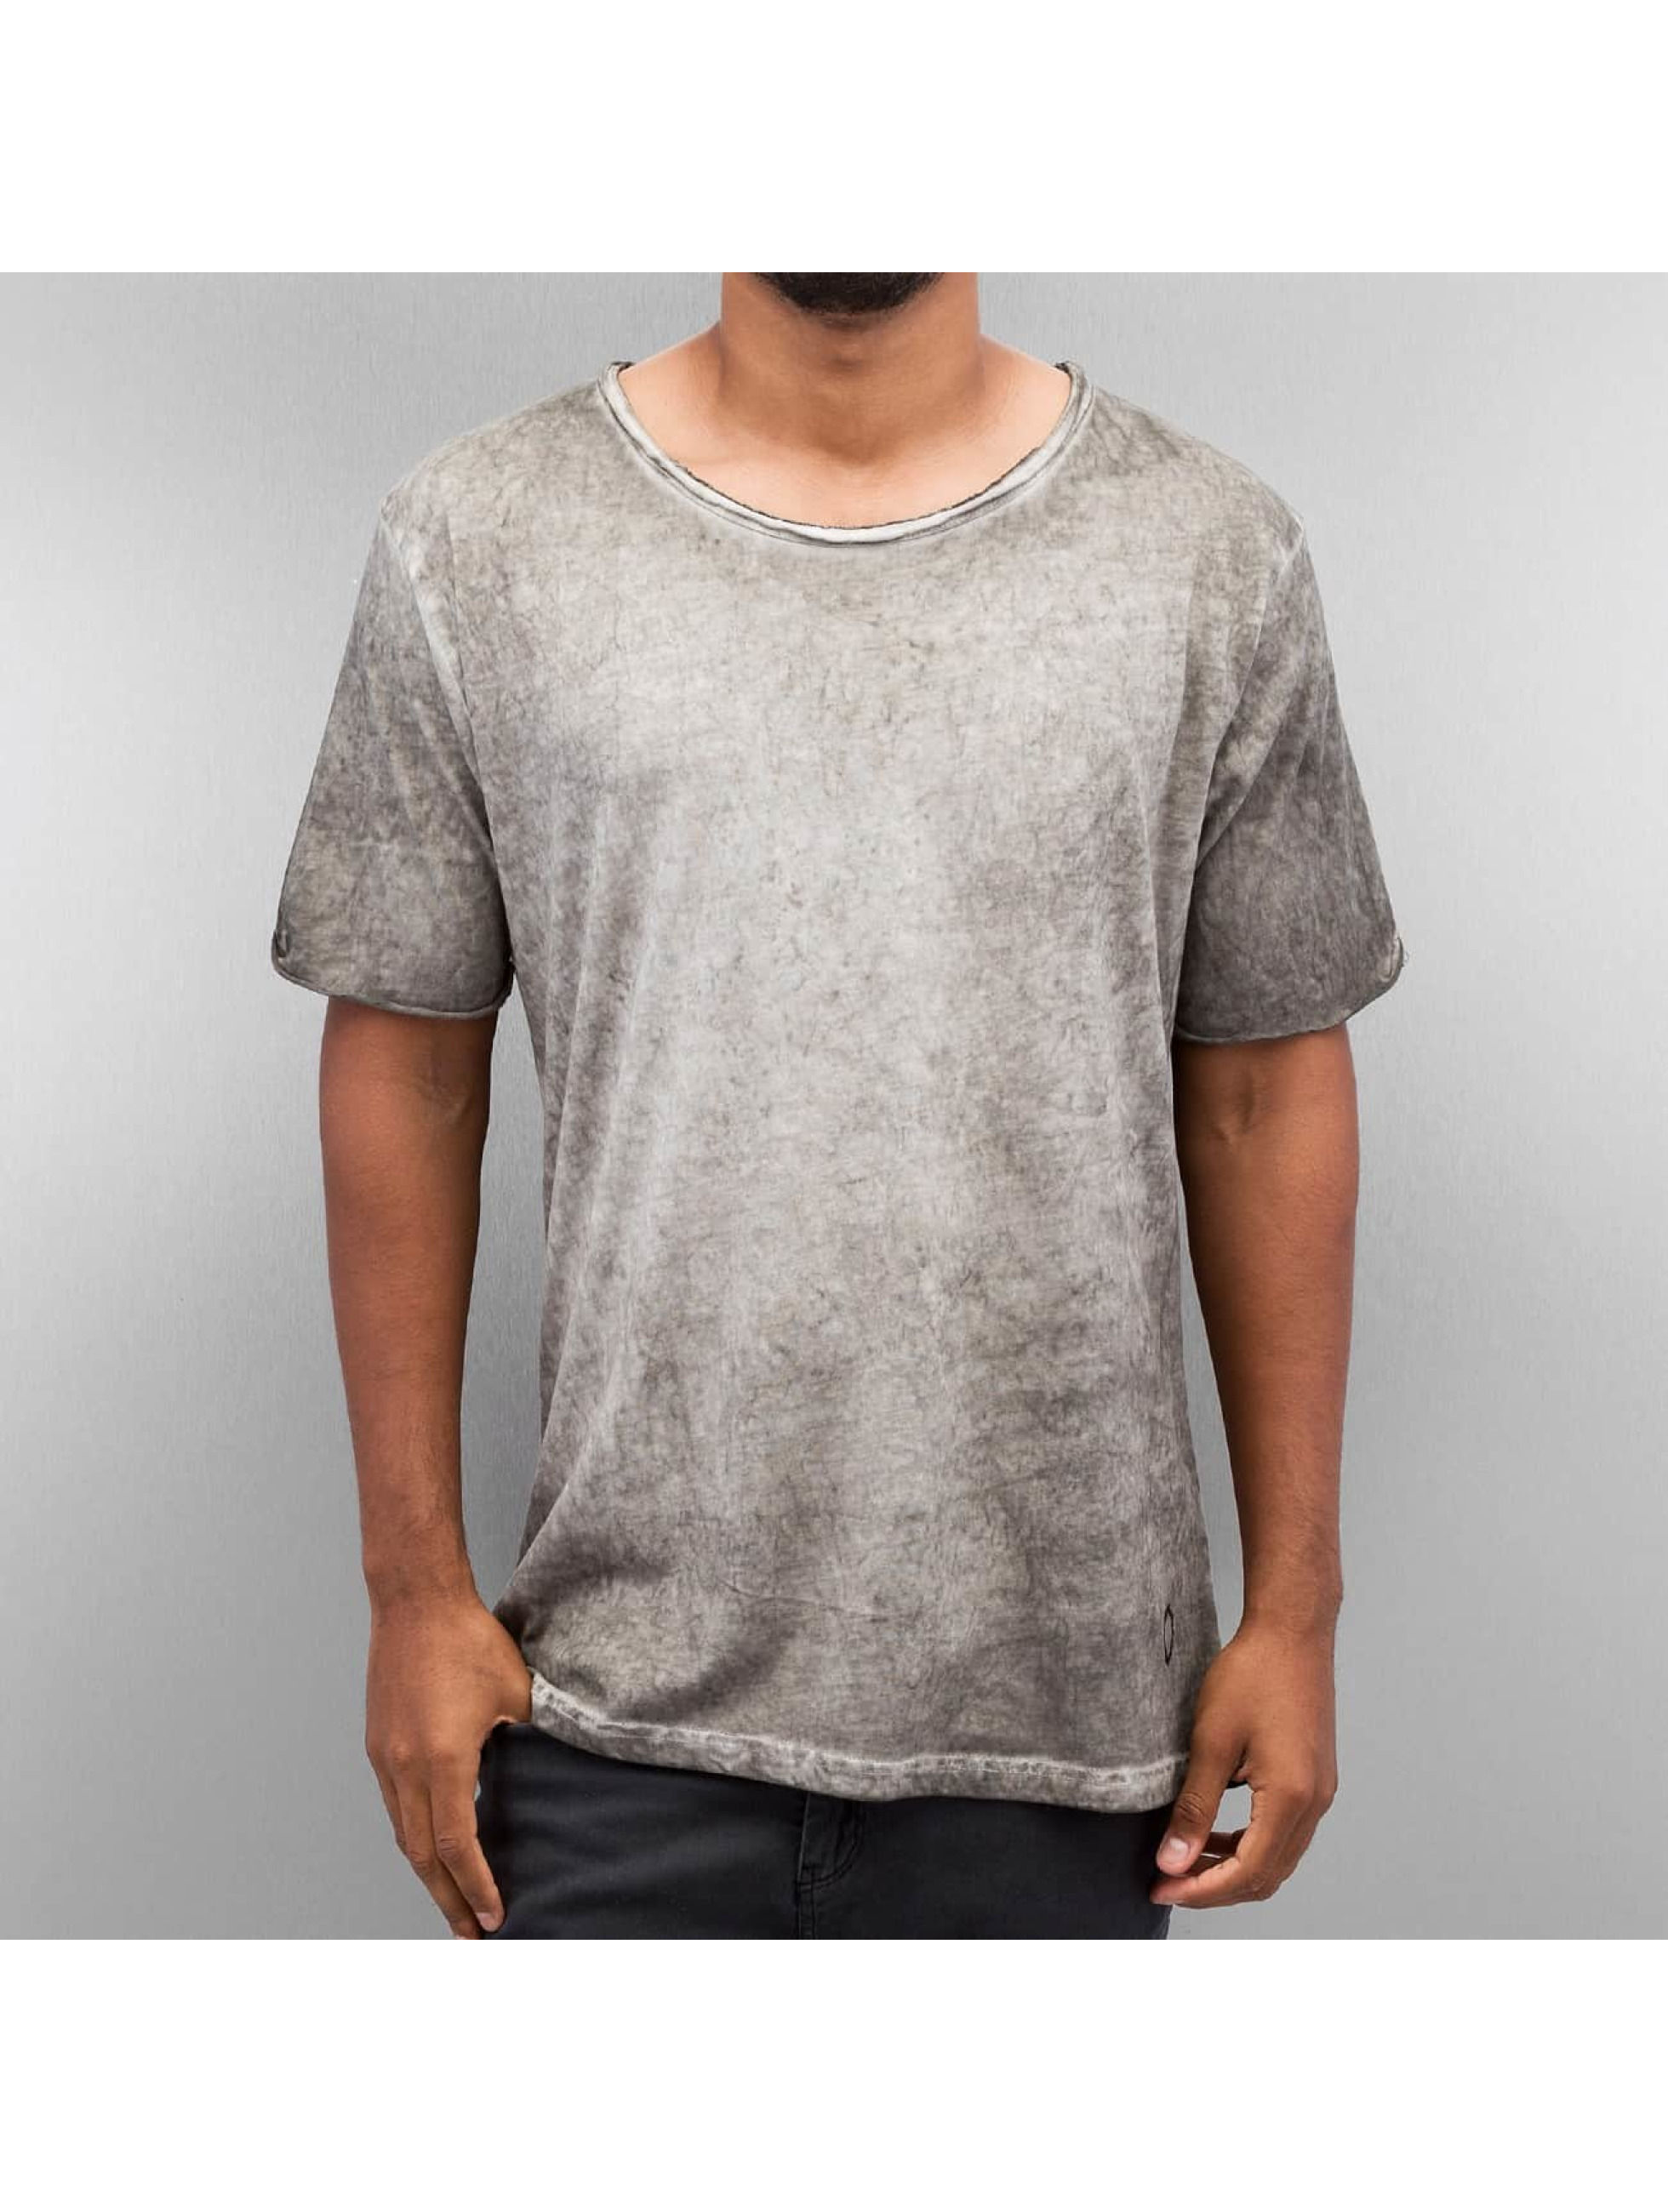 Yezz Männer T-Shirt Washed in grau